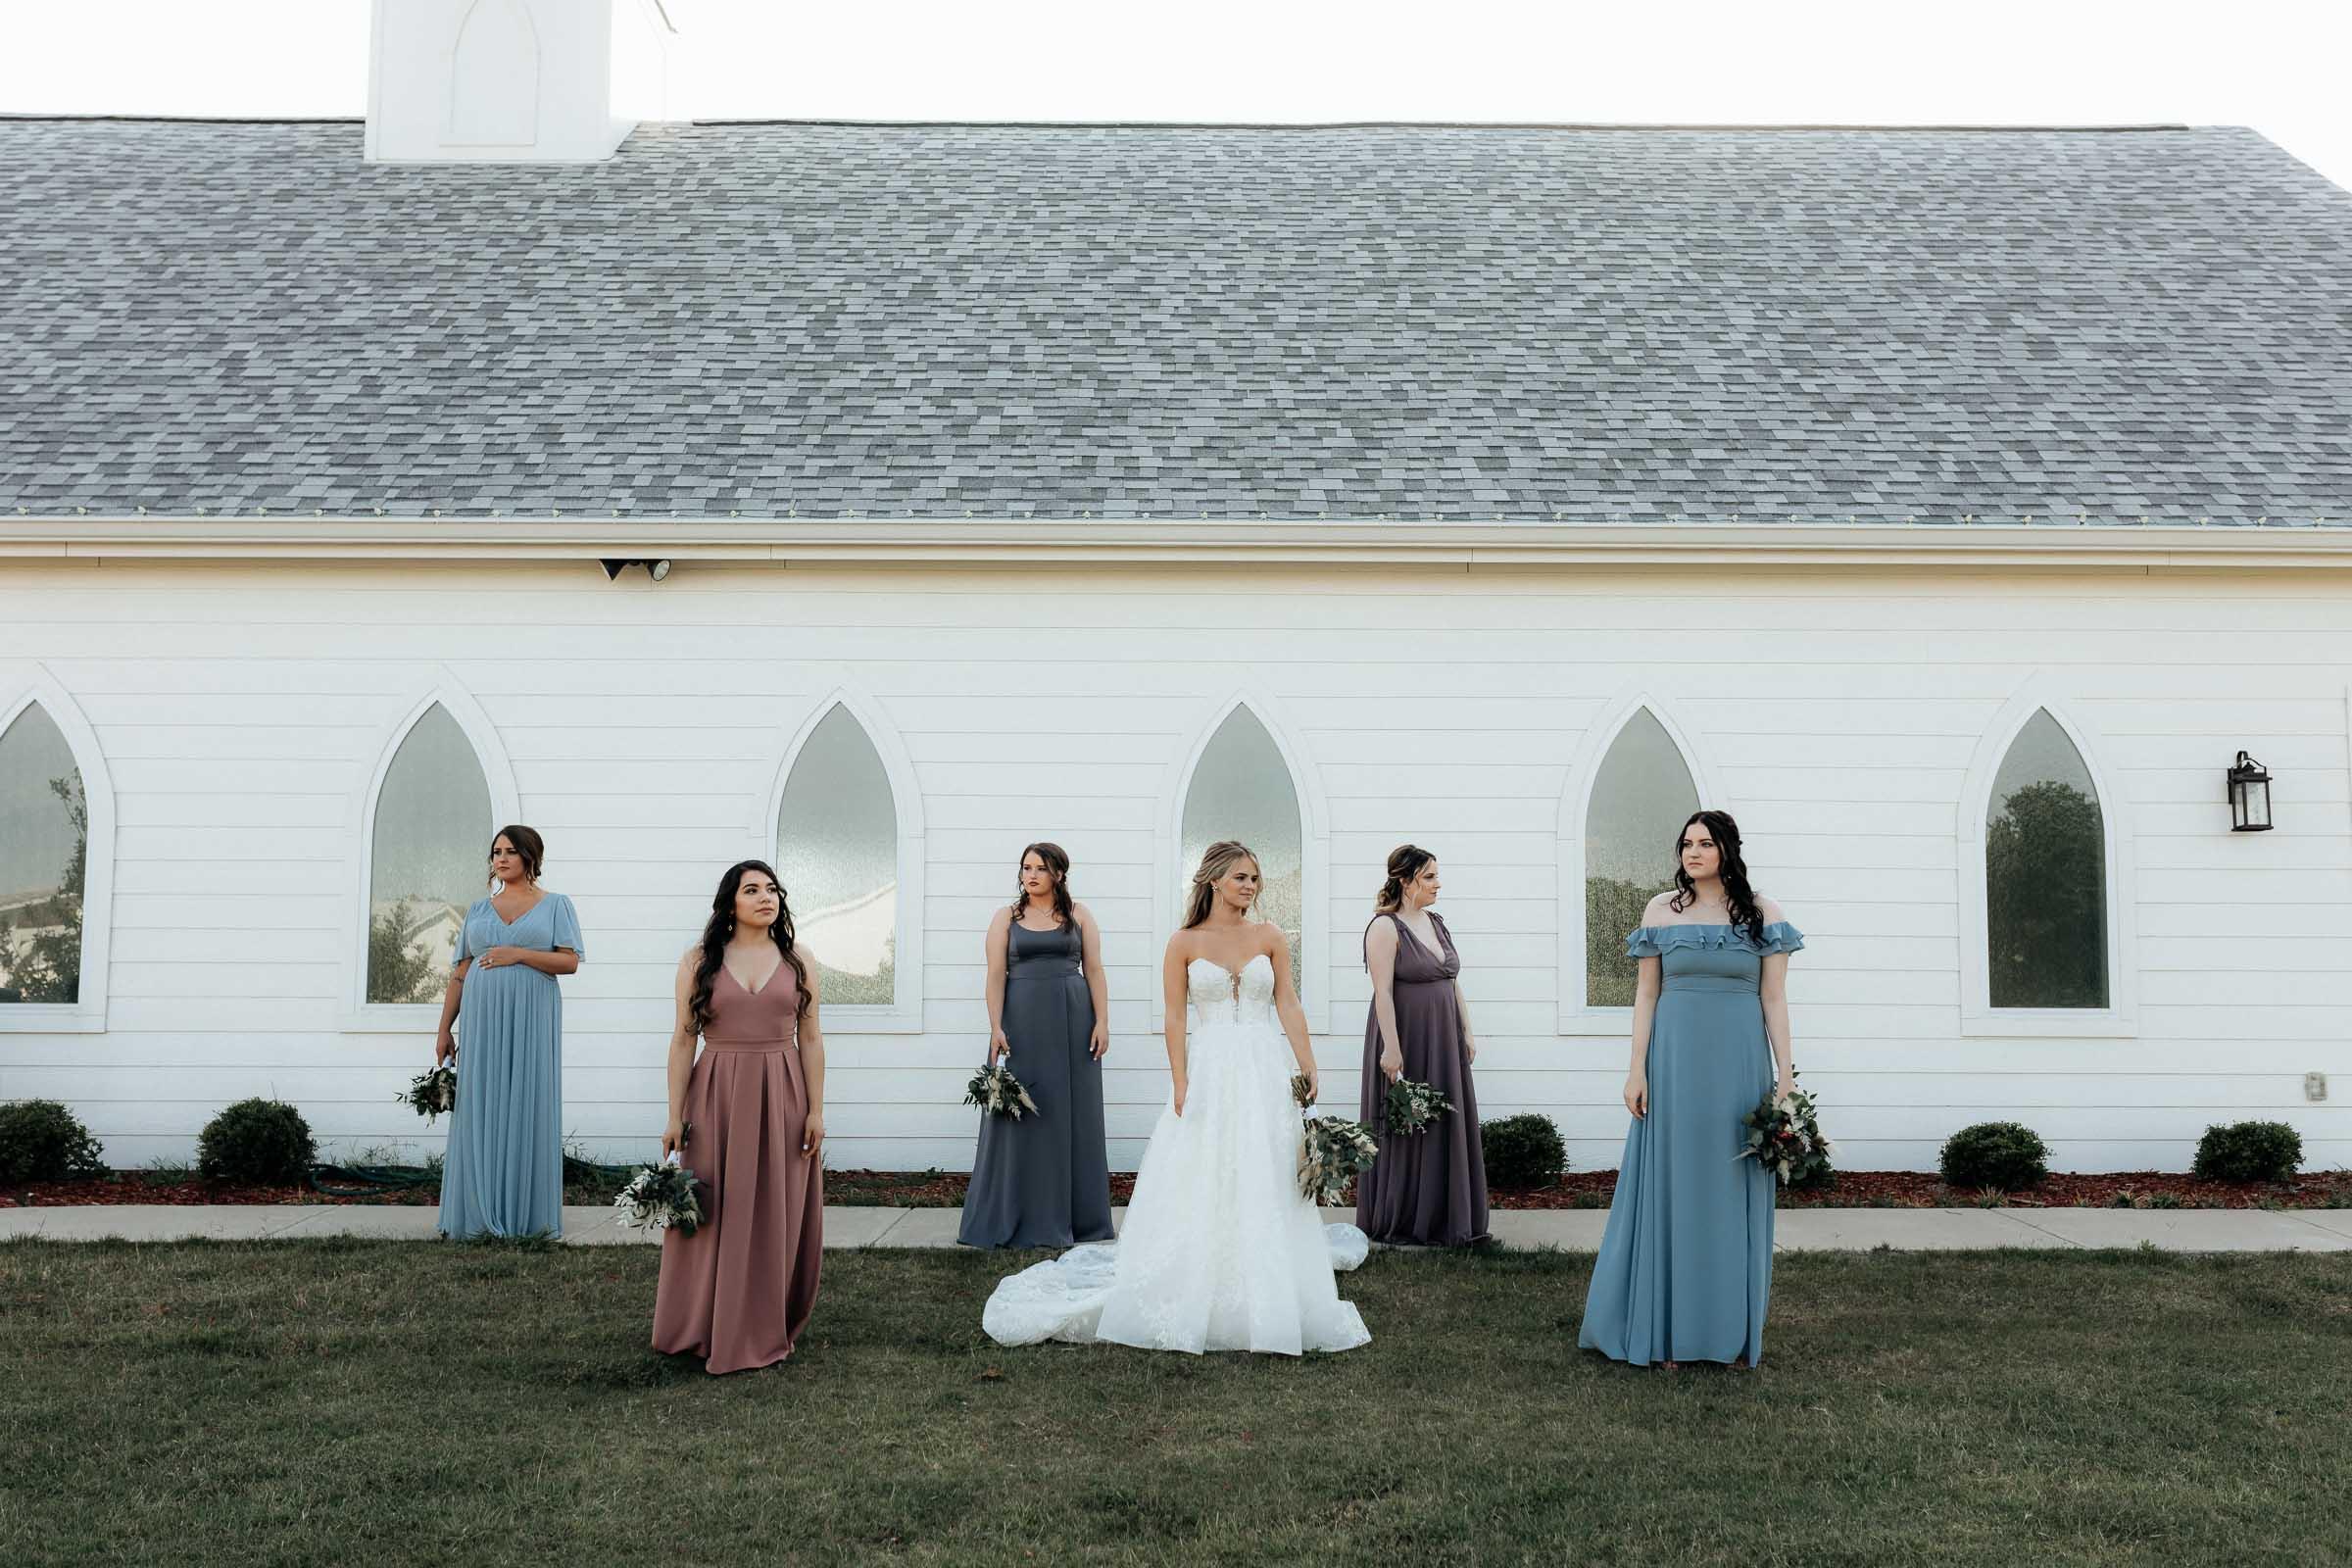 moody bridesmaid portrait dfw wedding